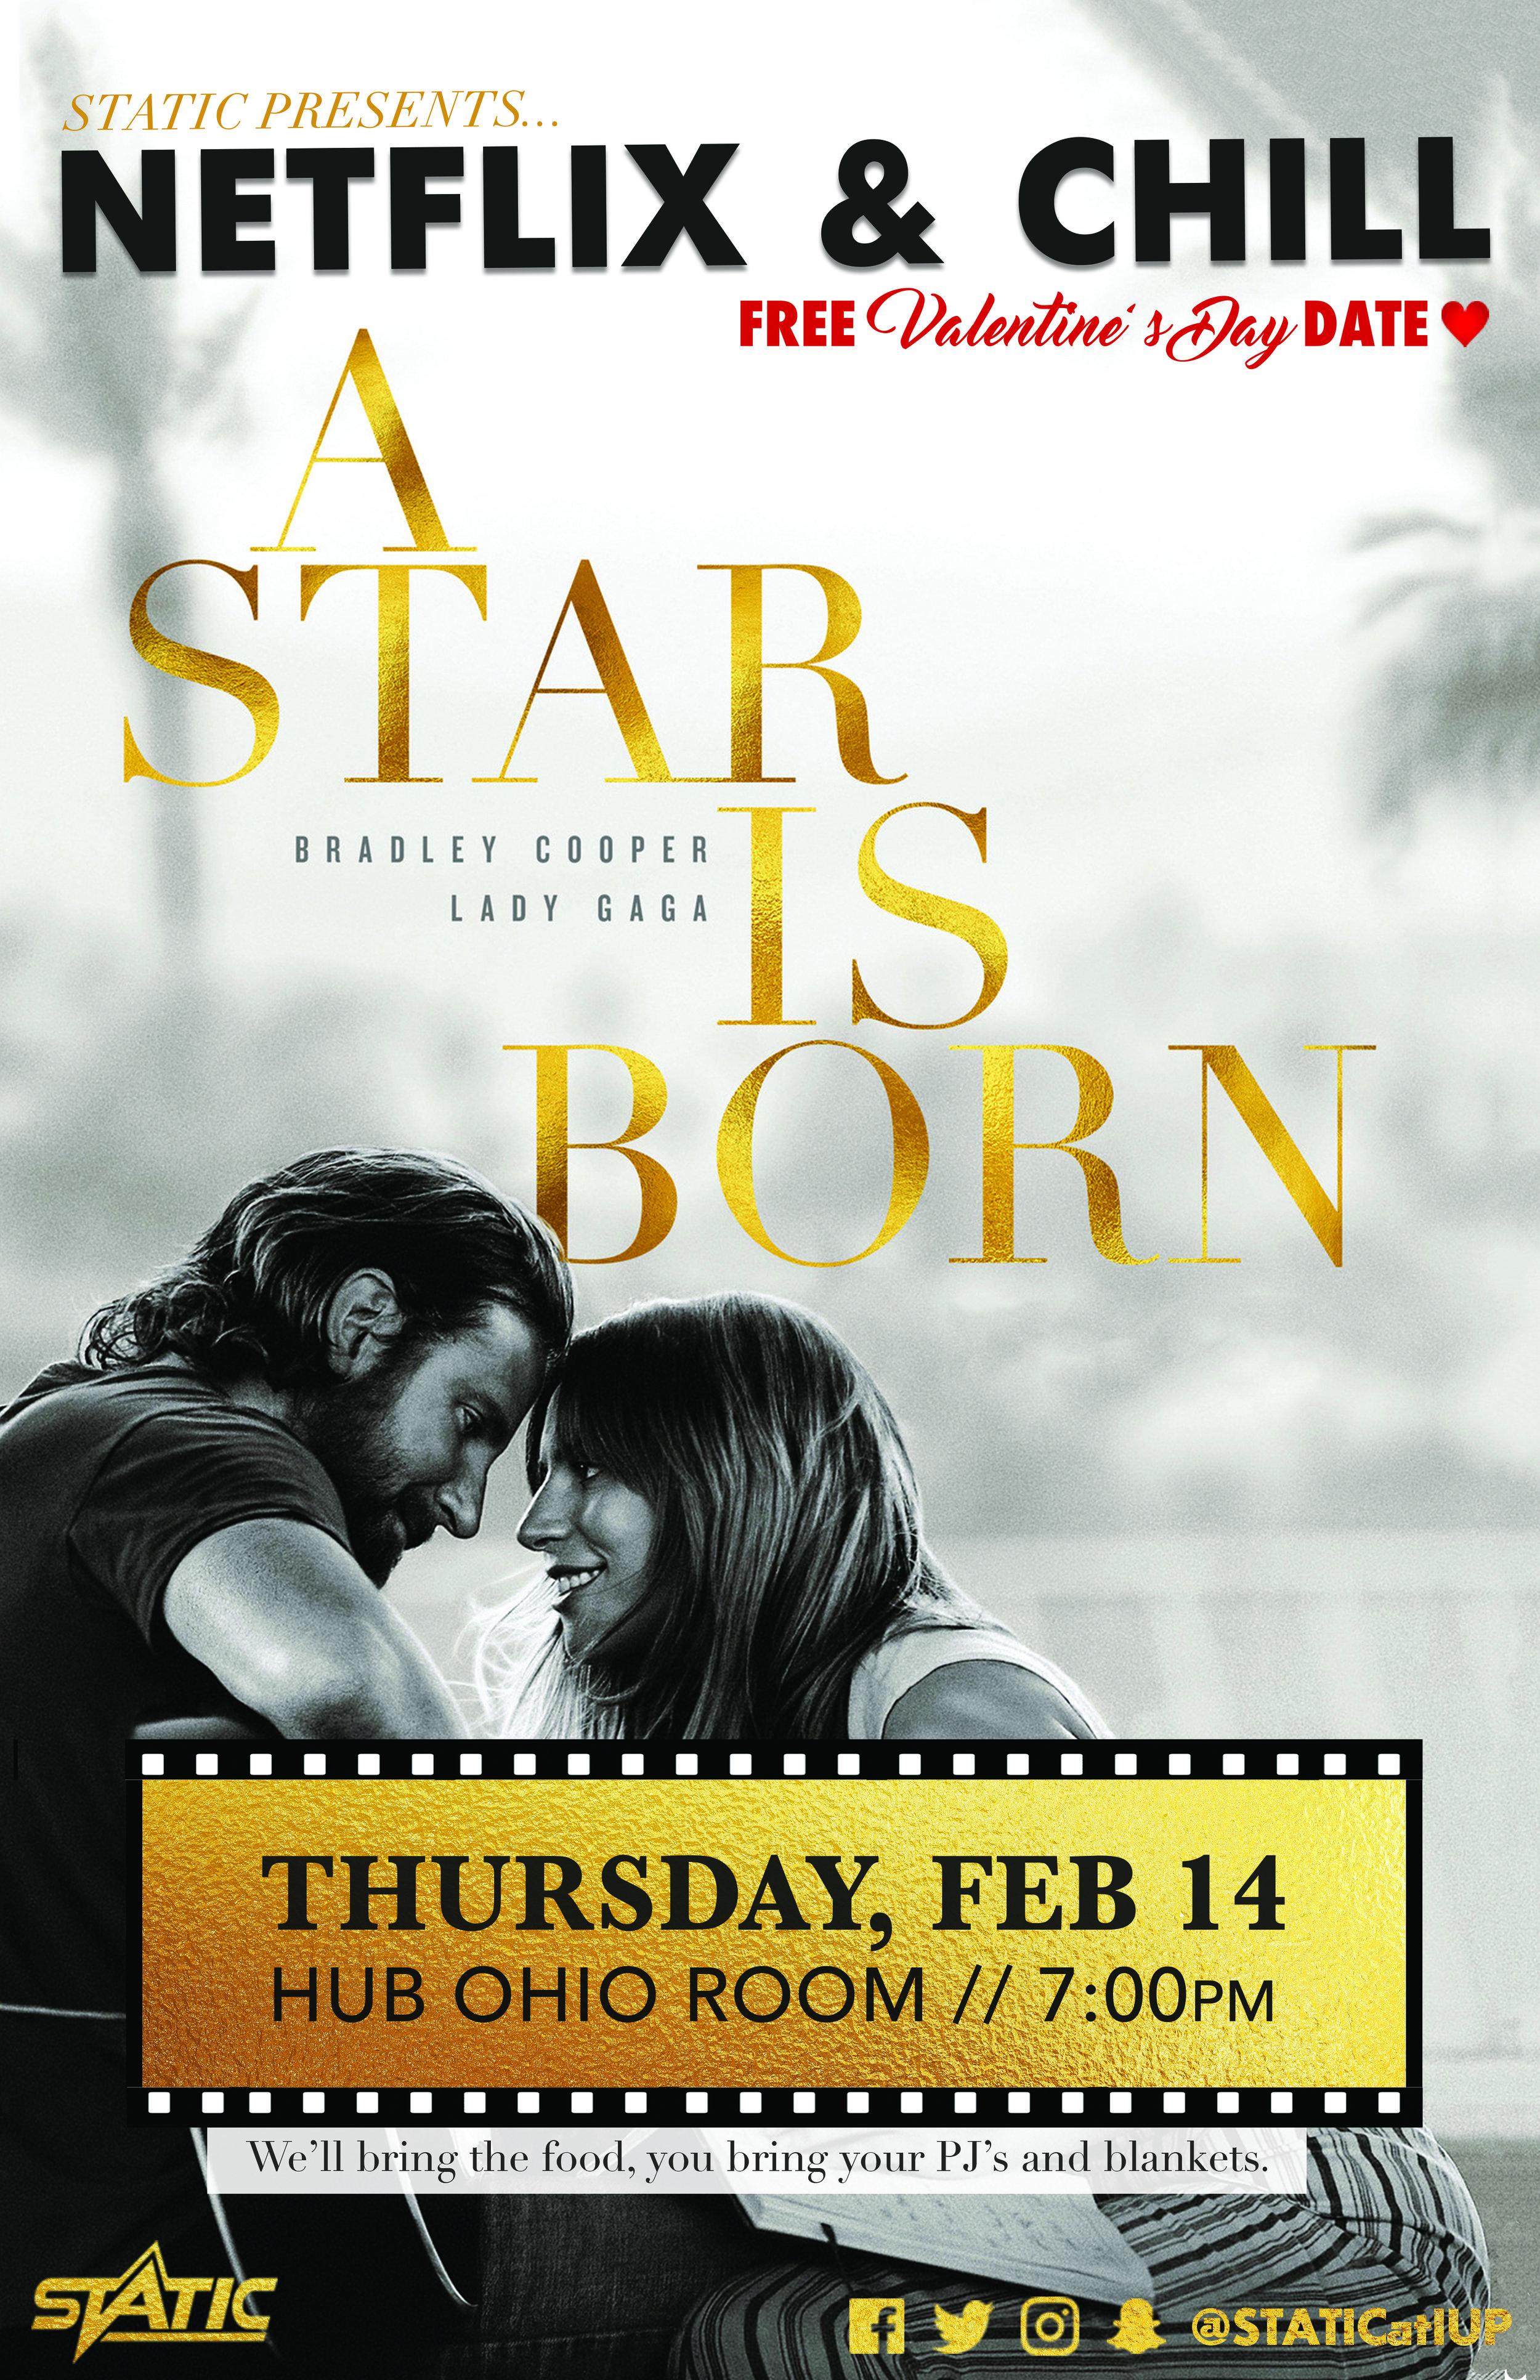 Netflix & Chill - A Star Is Born.jpg